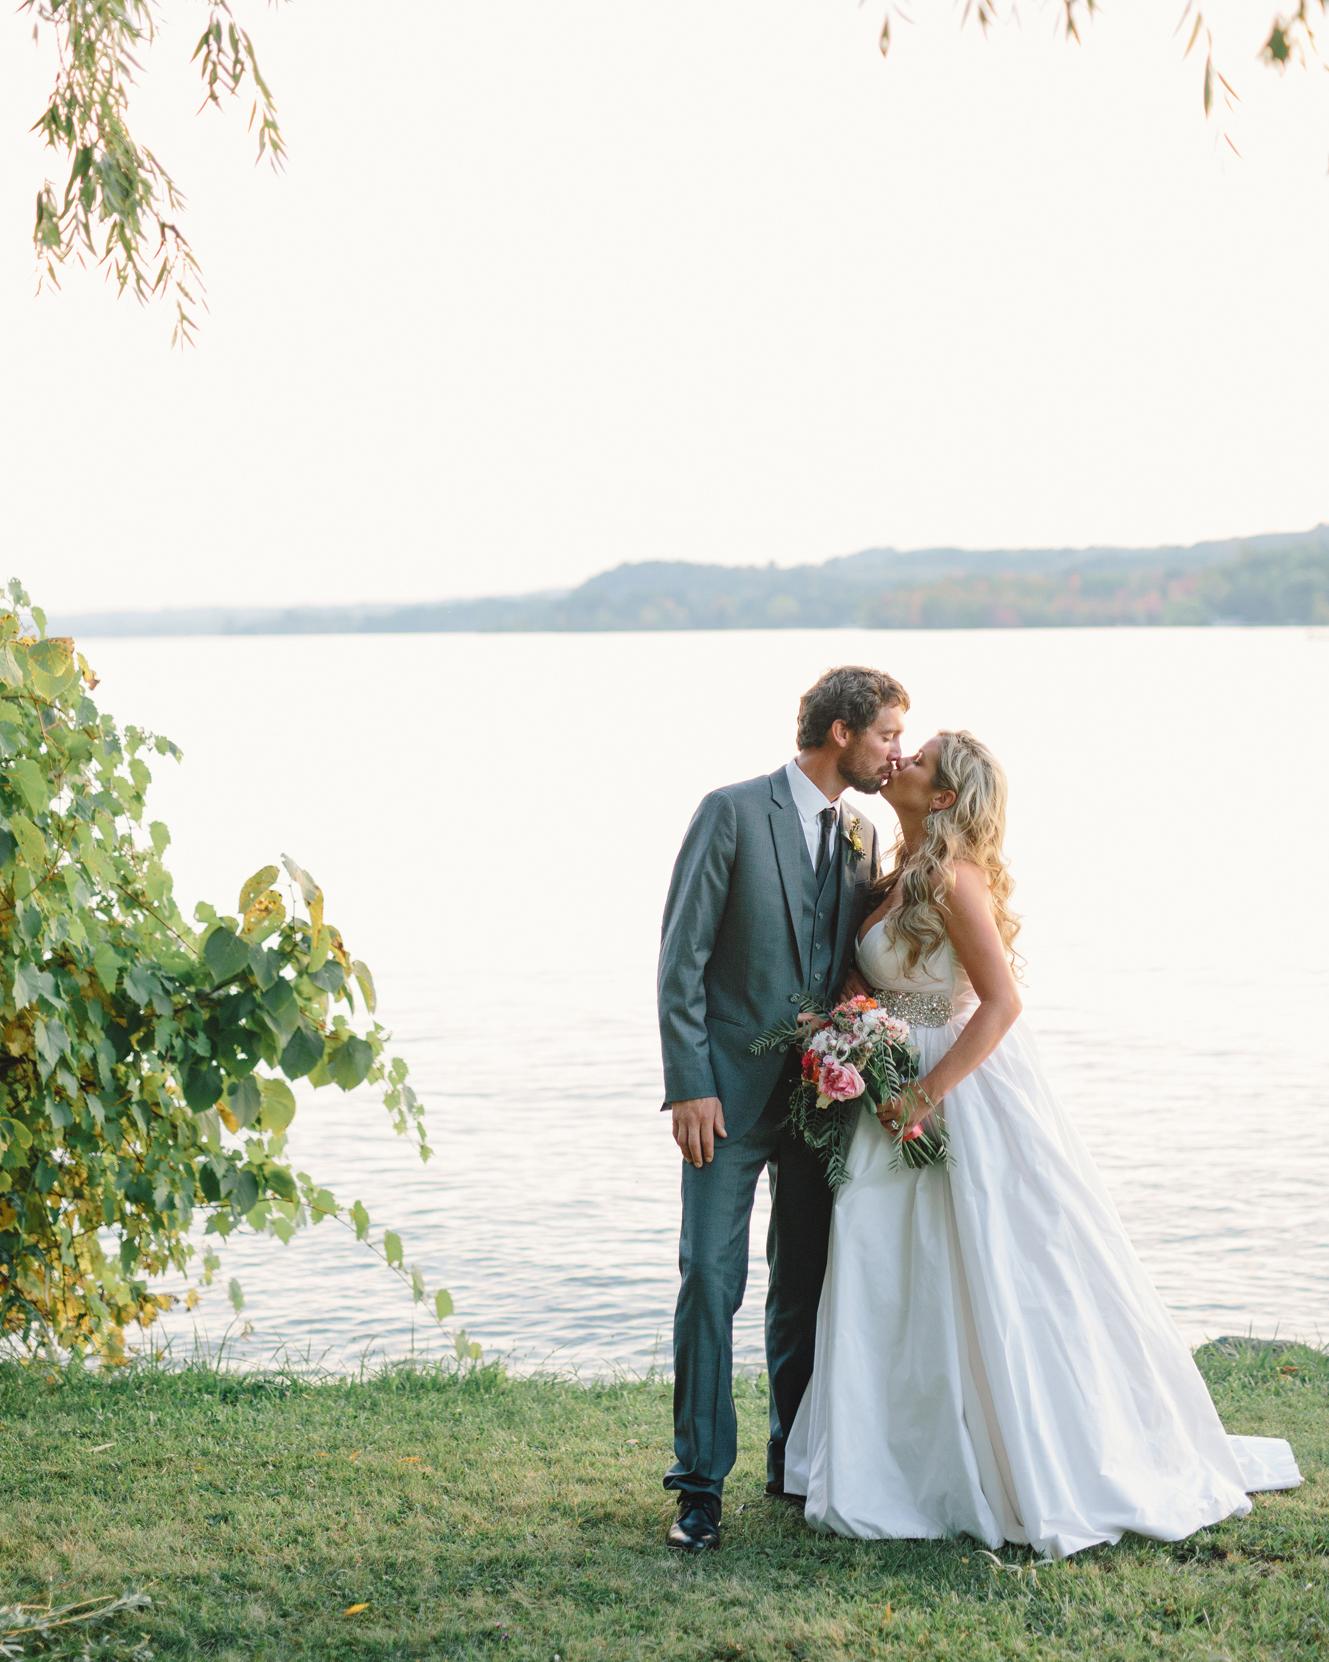 lizzy-bucky-wedding-couple-515-s111857-0315.jpg